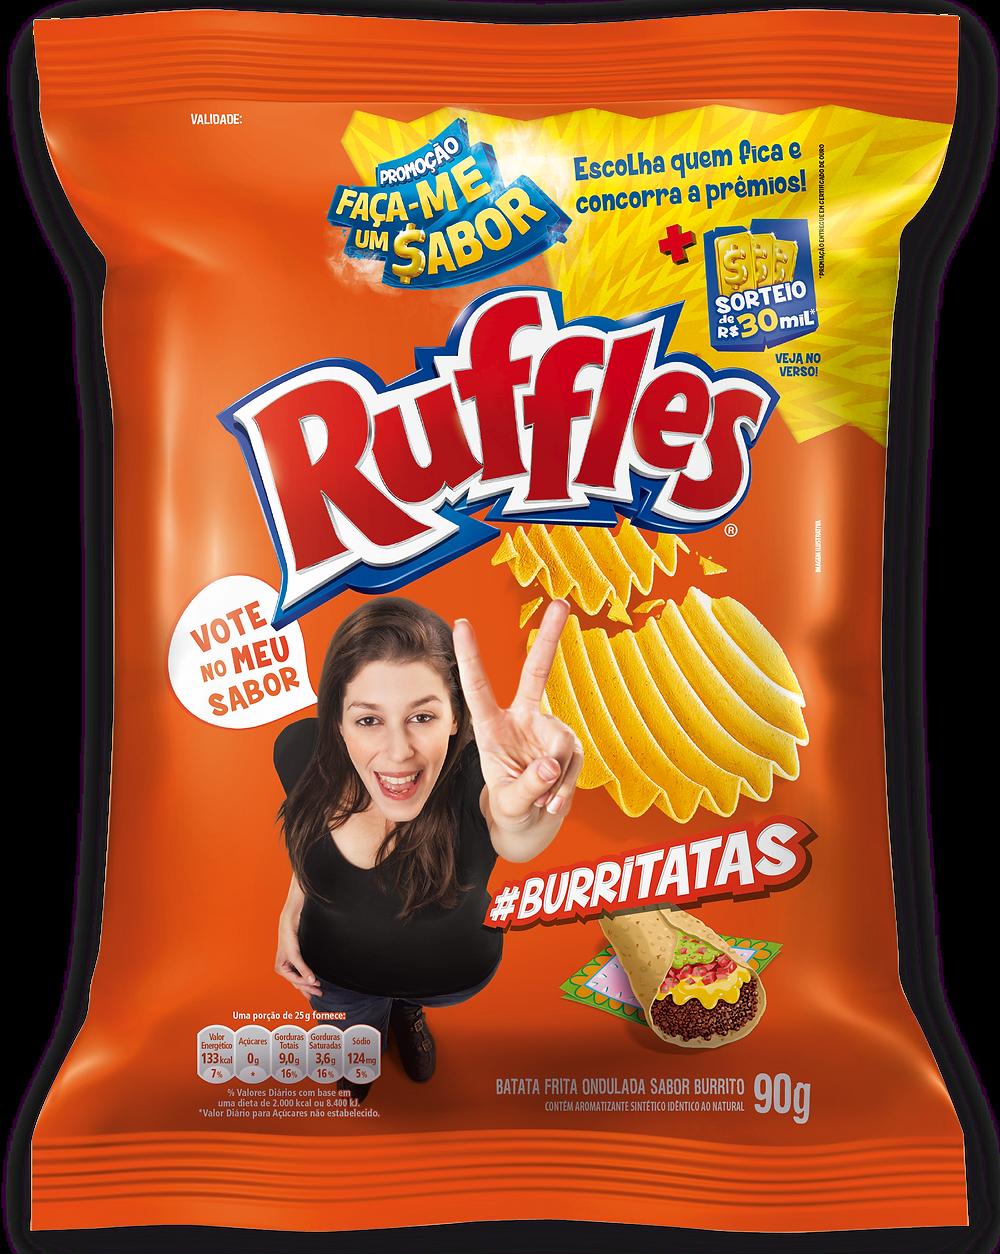 Ruffles burritadas